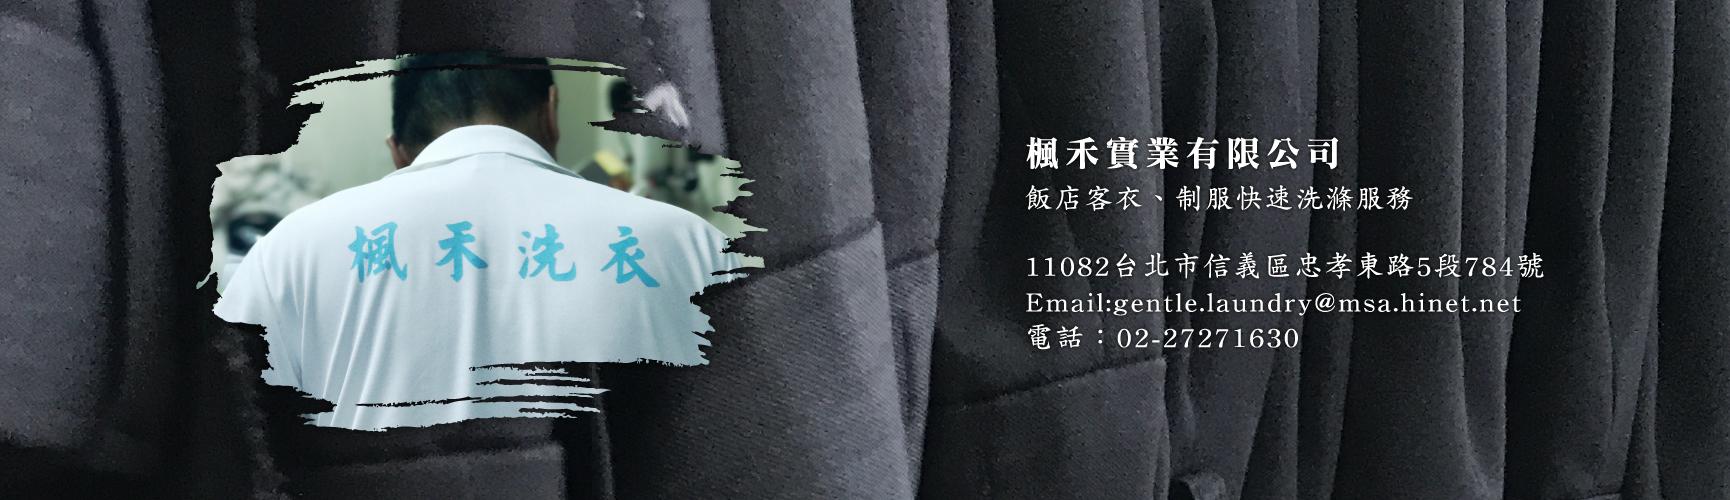 20170711162456883-original-楓禾極速架站.jpg